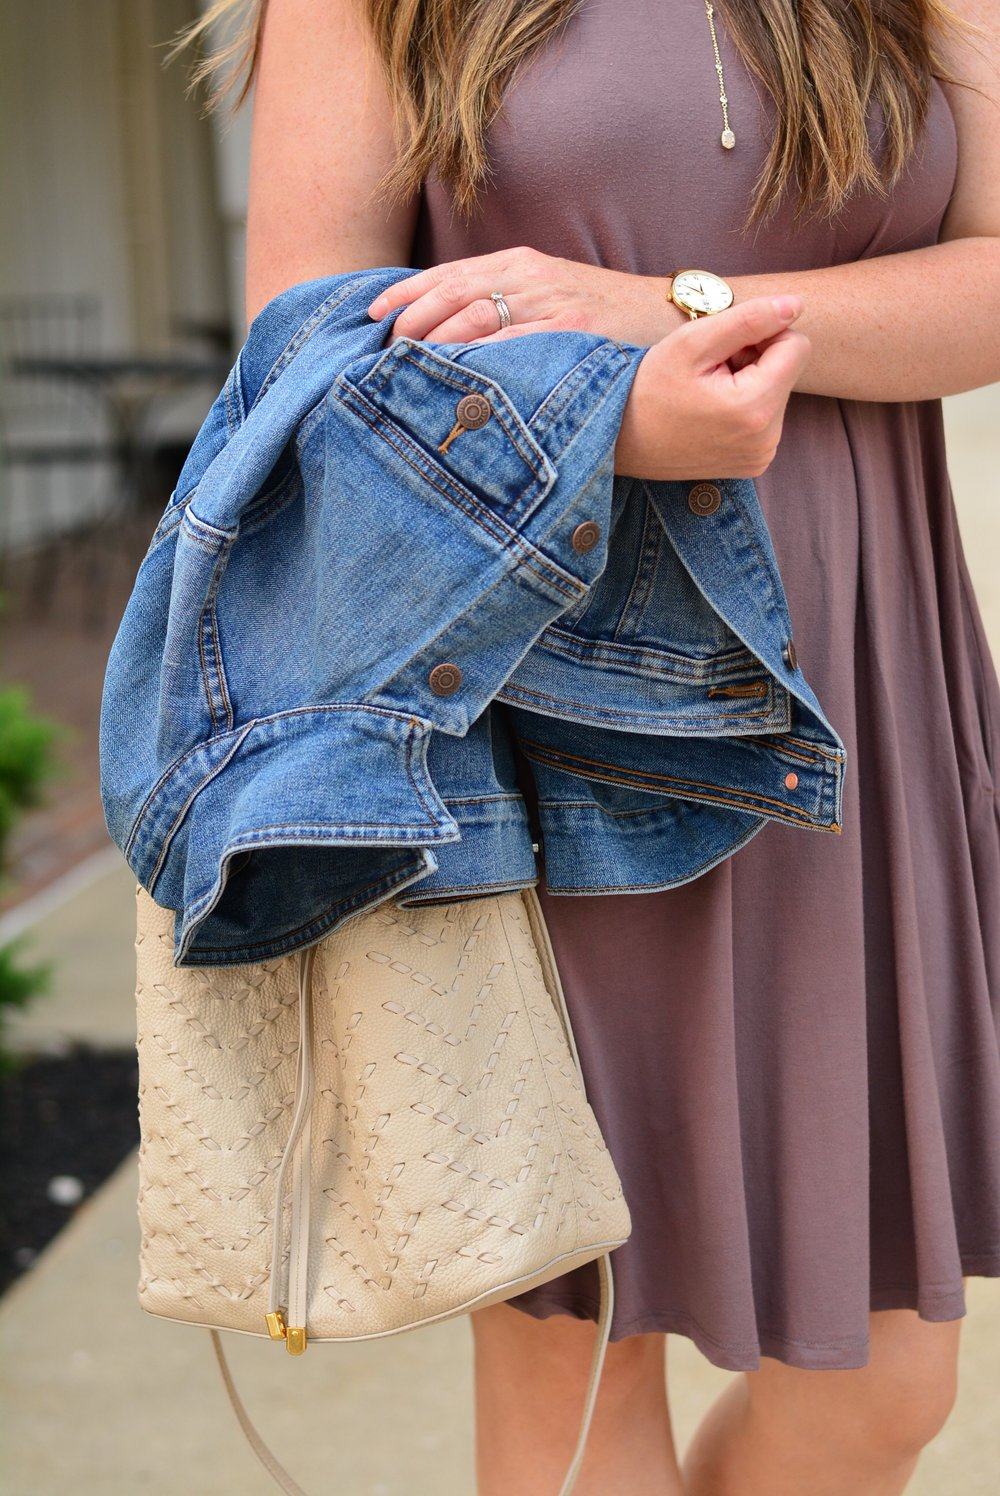 denim jacket with ivory bag